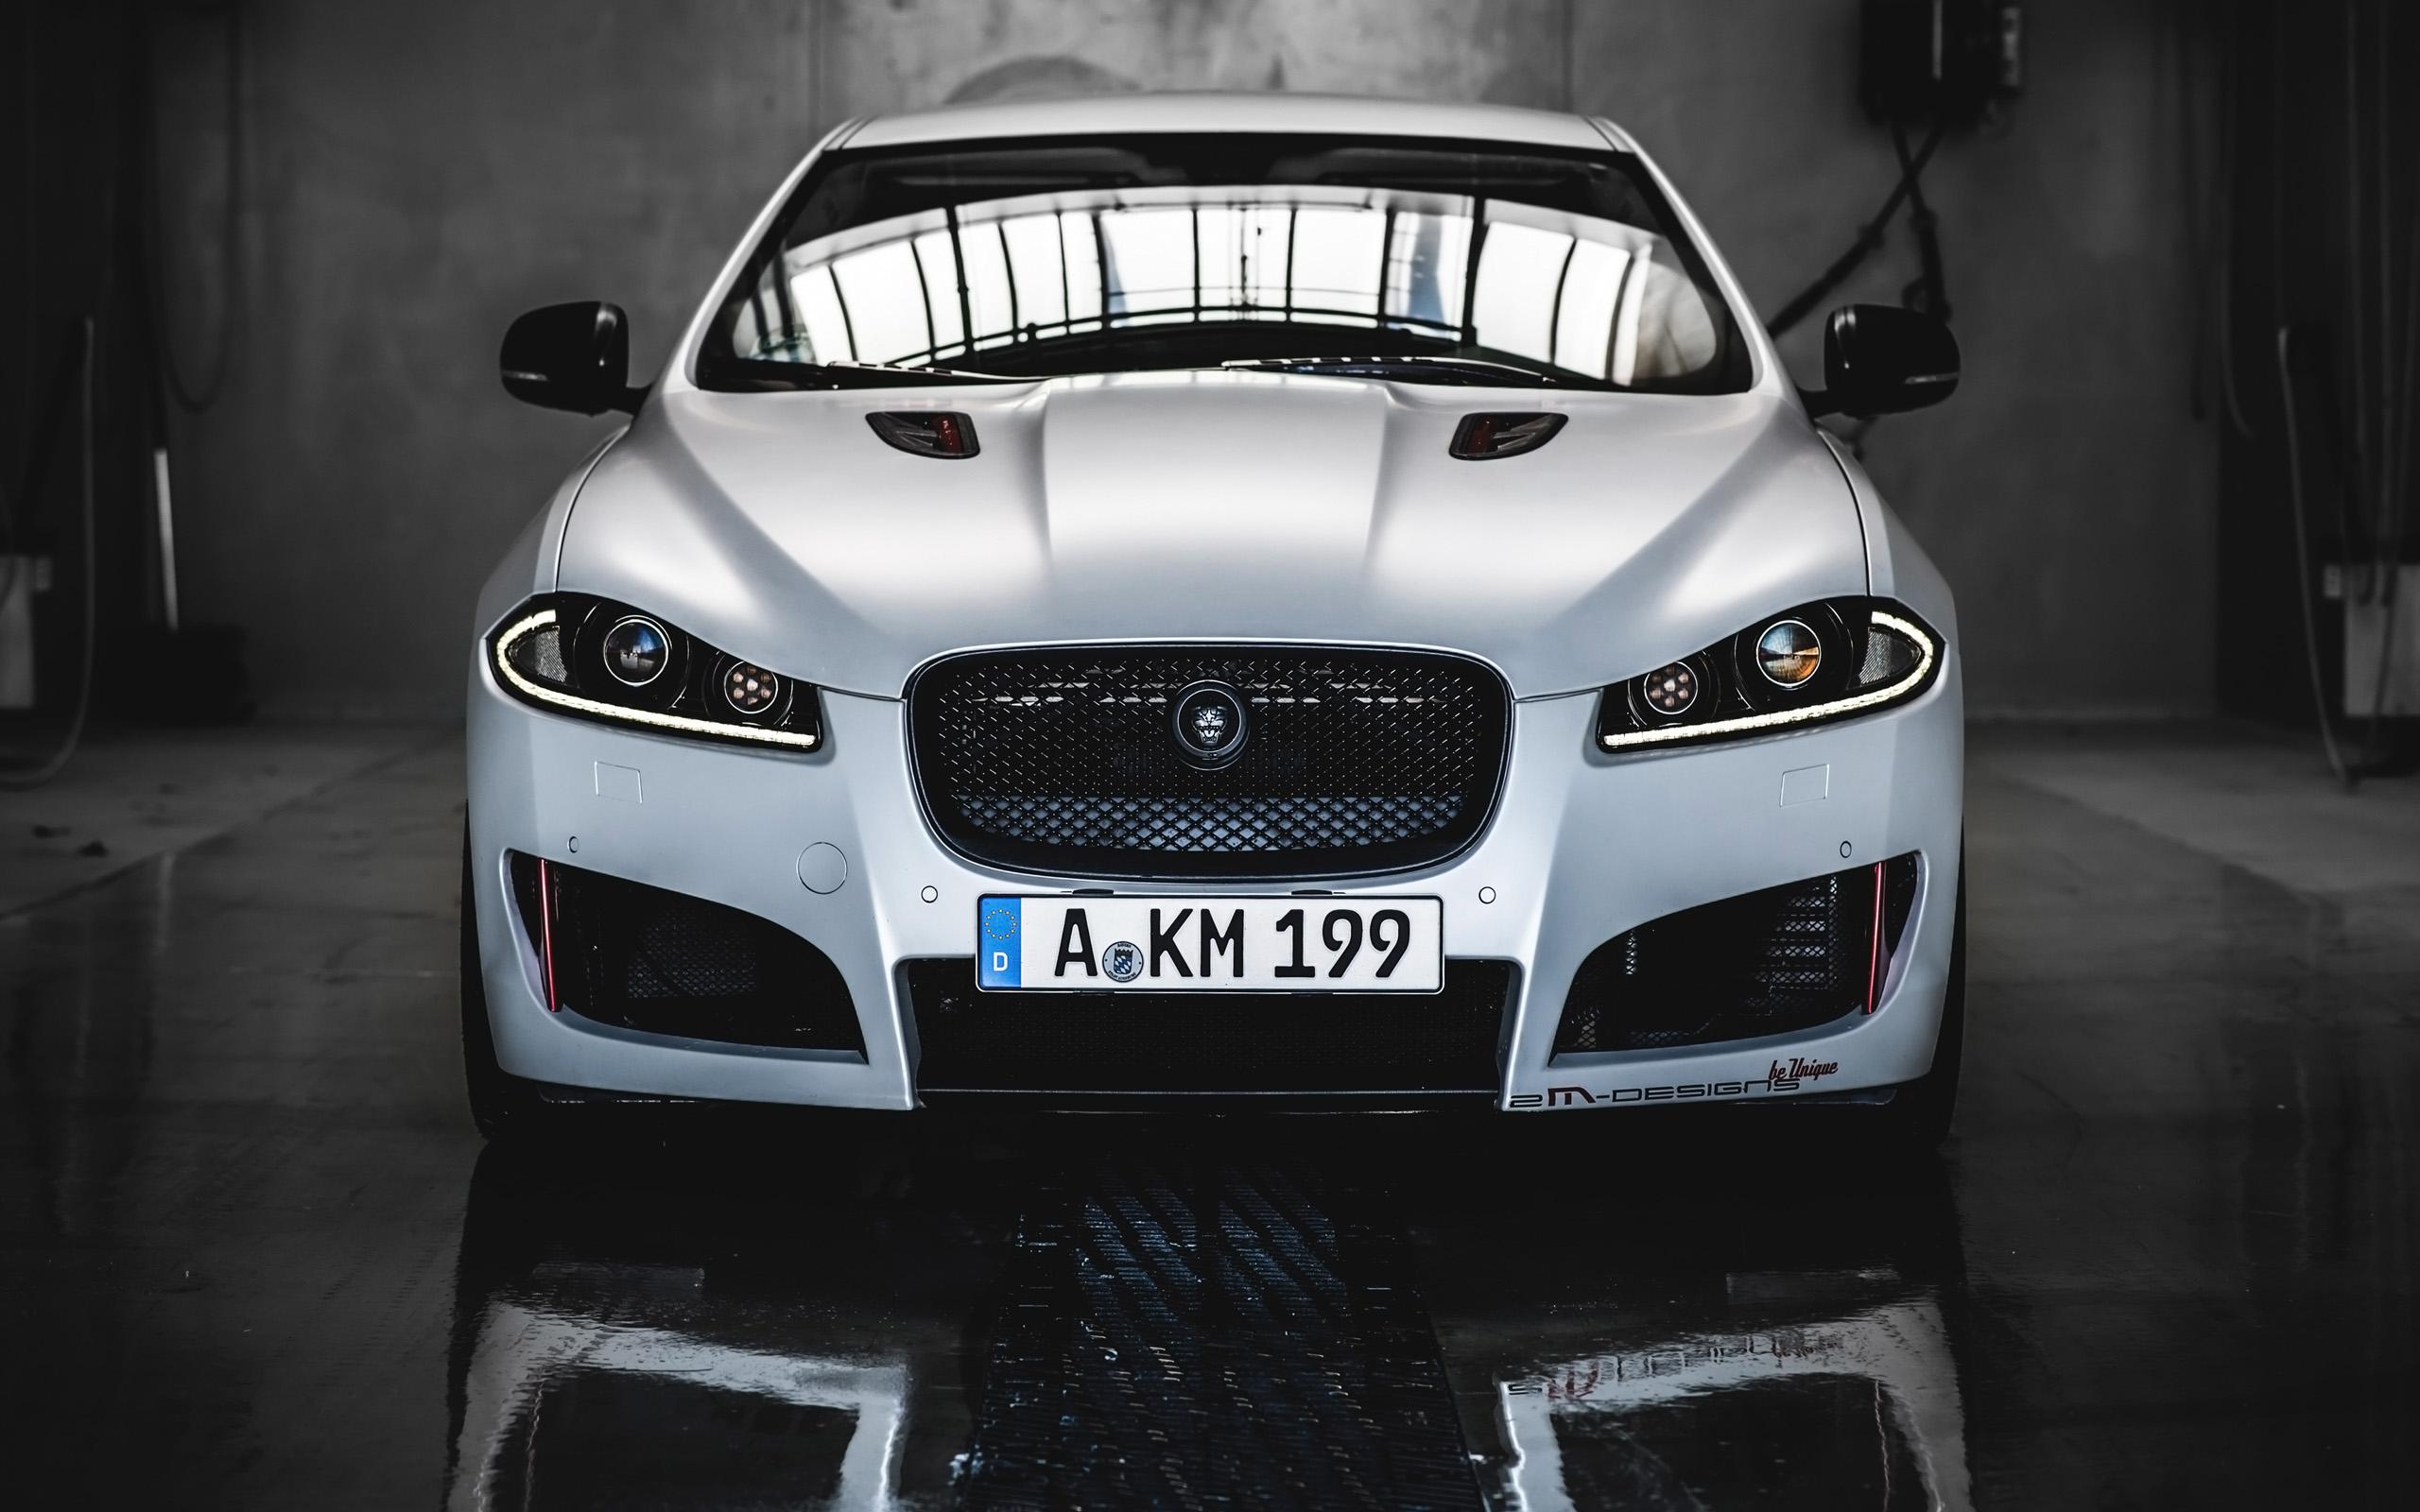 Jaguar Cars Wallpaper Hd Popular Desktop Wallpaper